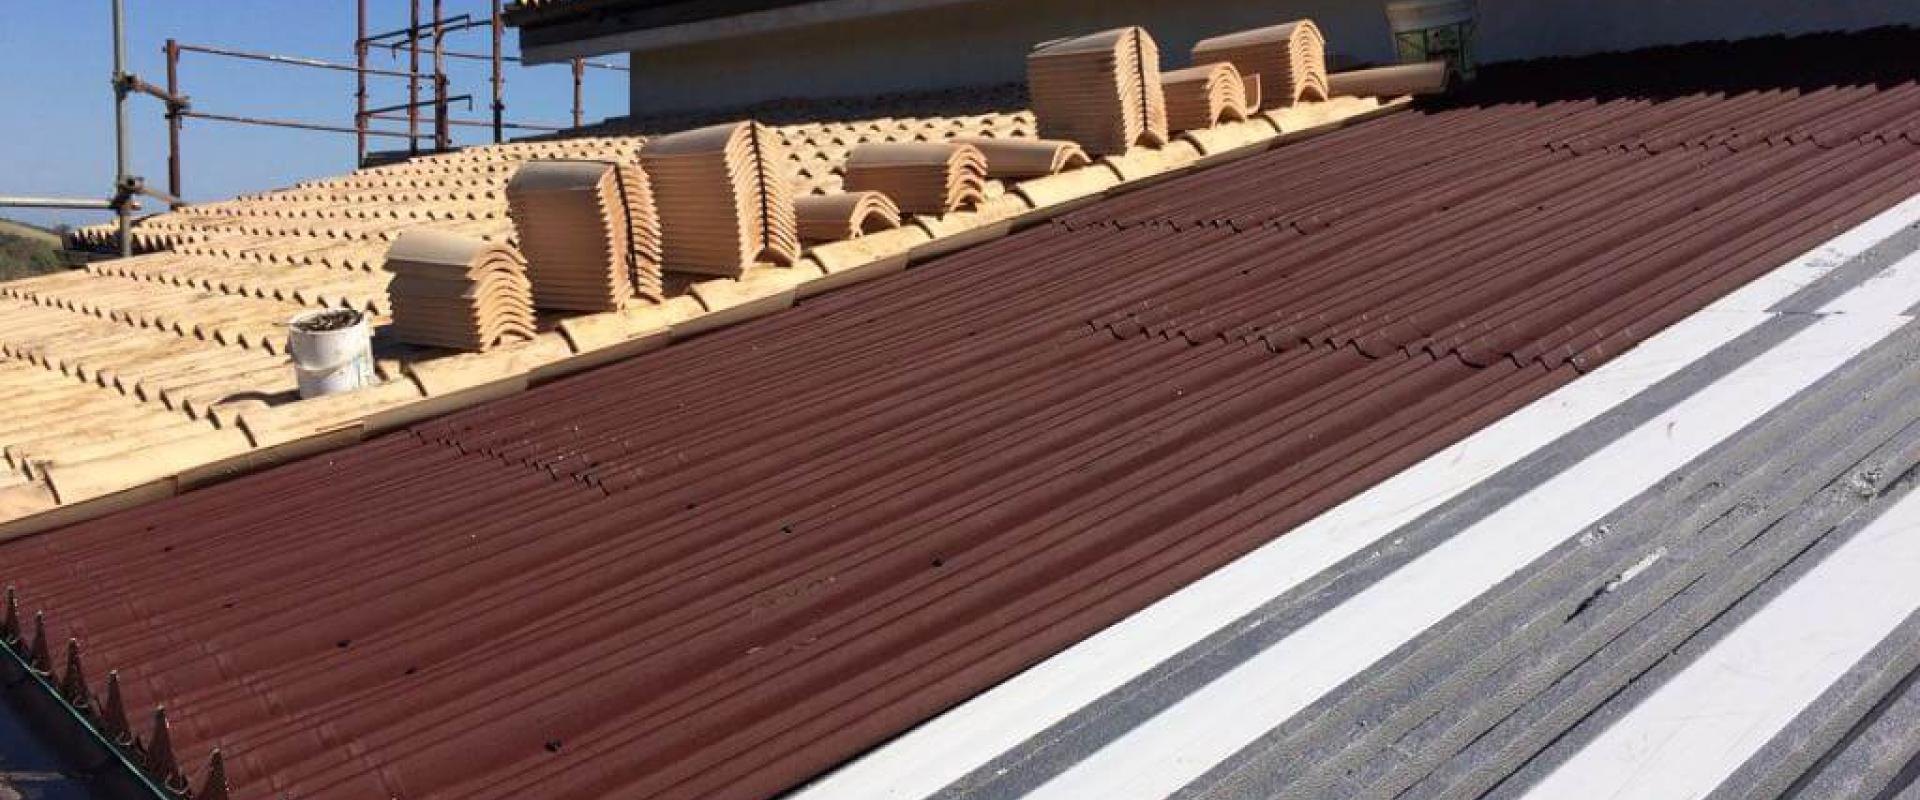 Solaio Laterocemento Anni 50 onduline roofing system premium rs | onduline